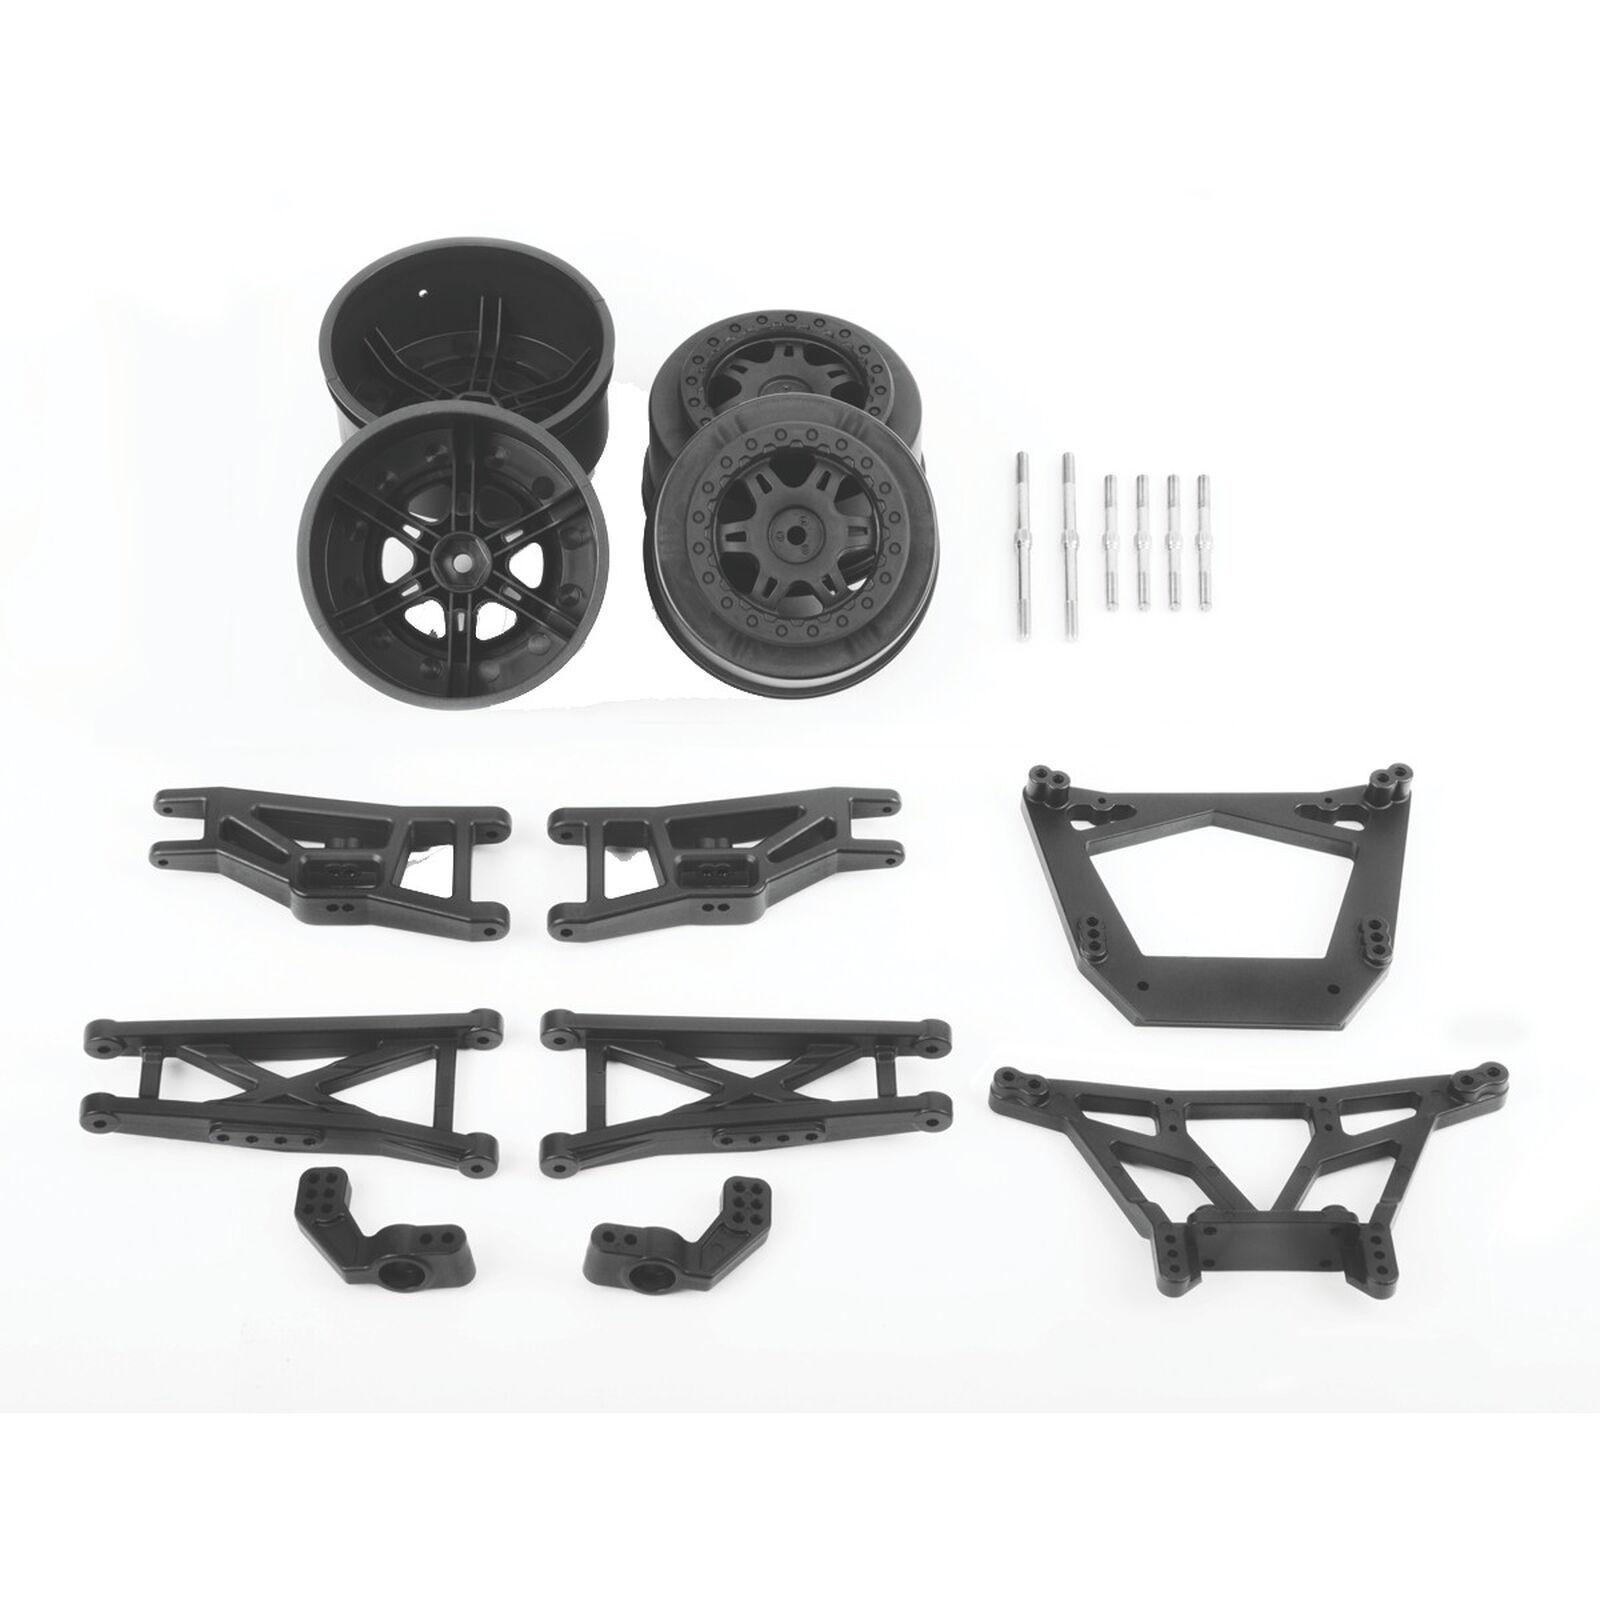 1/10 ProTrac Suspension Kit: Slash 2wd